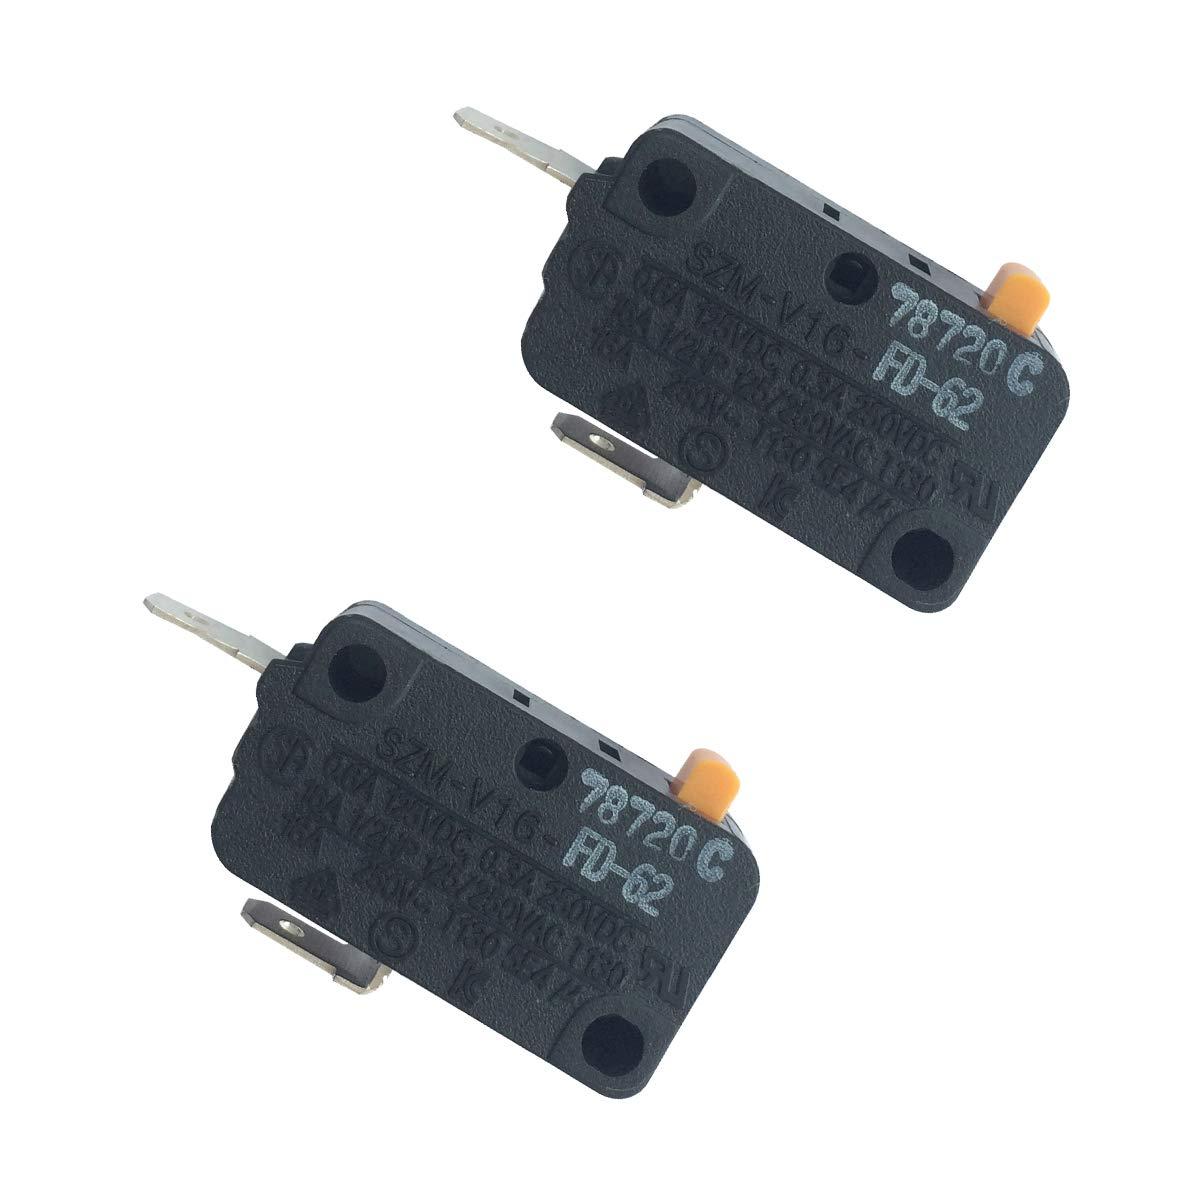 LONYE SZM-V16-FD-62 WB24X830 Monitor Switch RE2 for